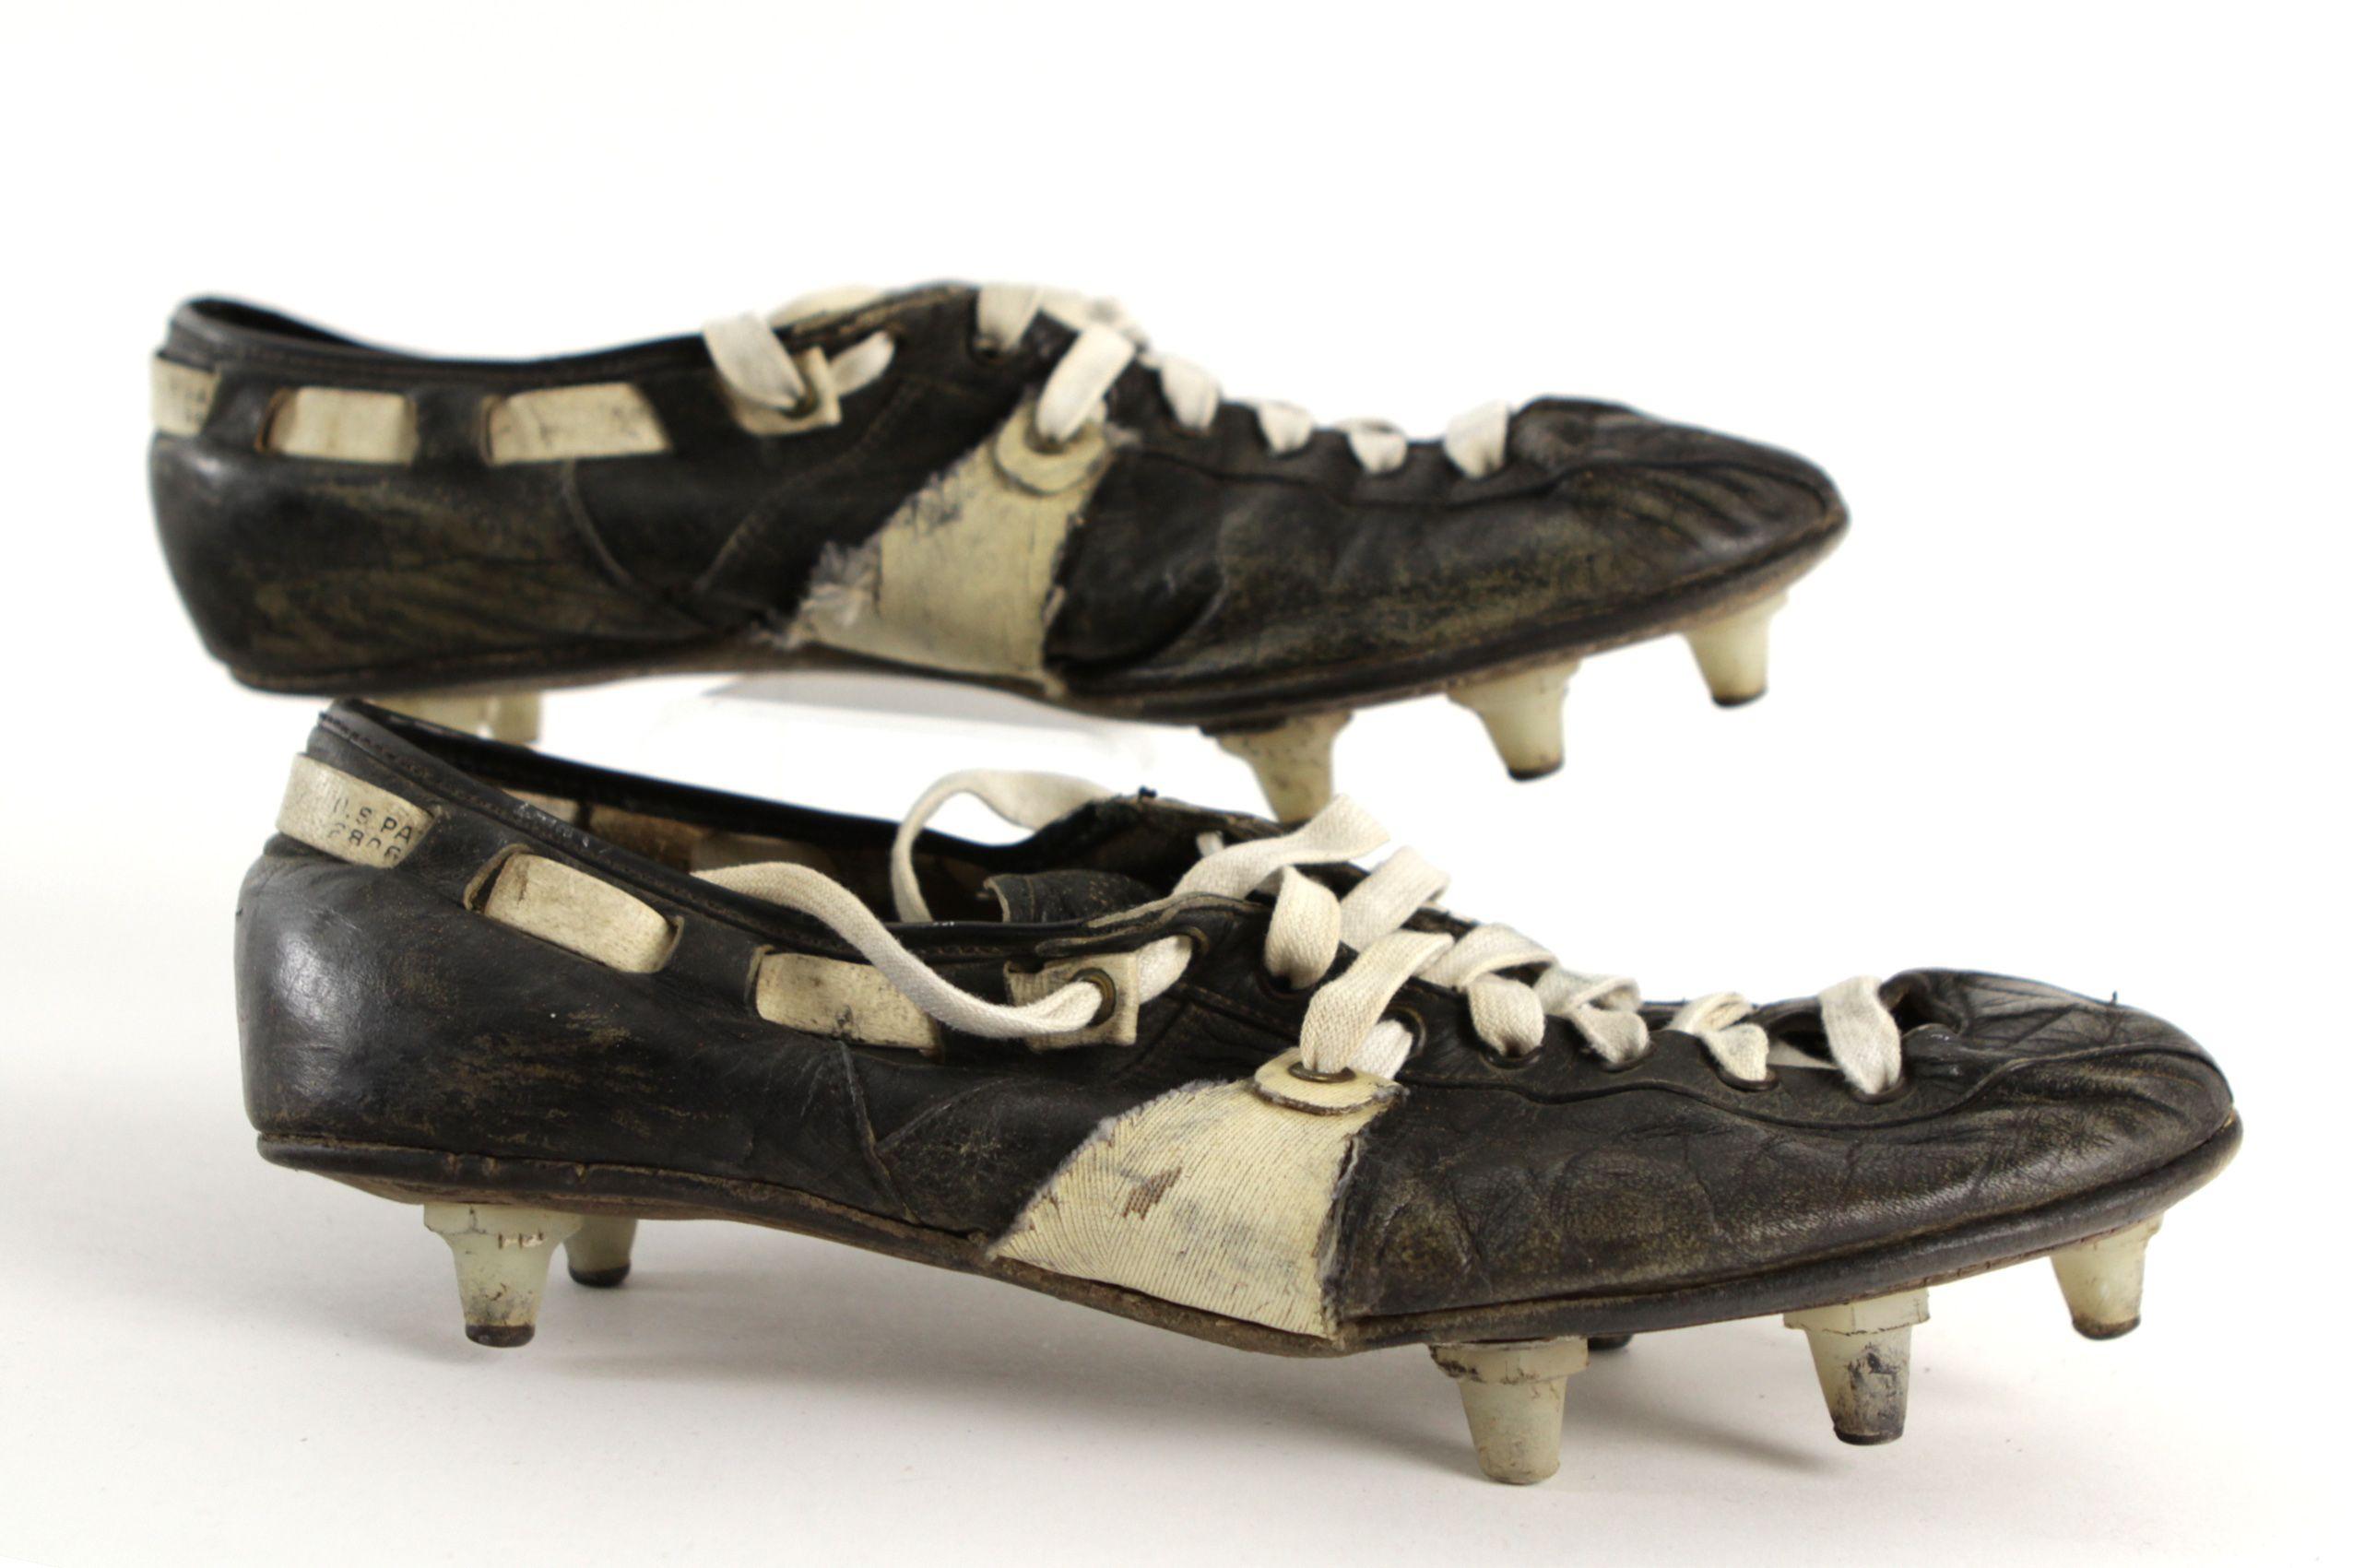 Game Worn Football Cleats (MEARS LOA